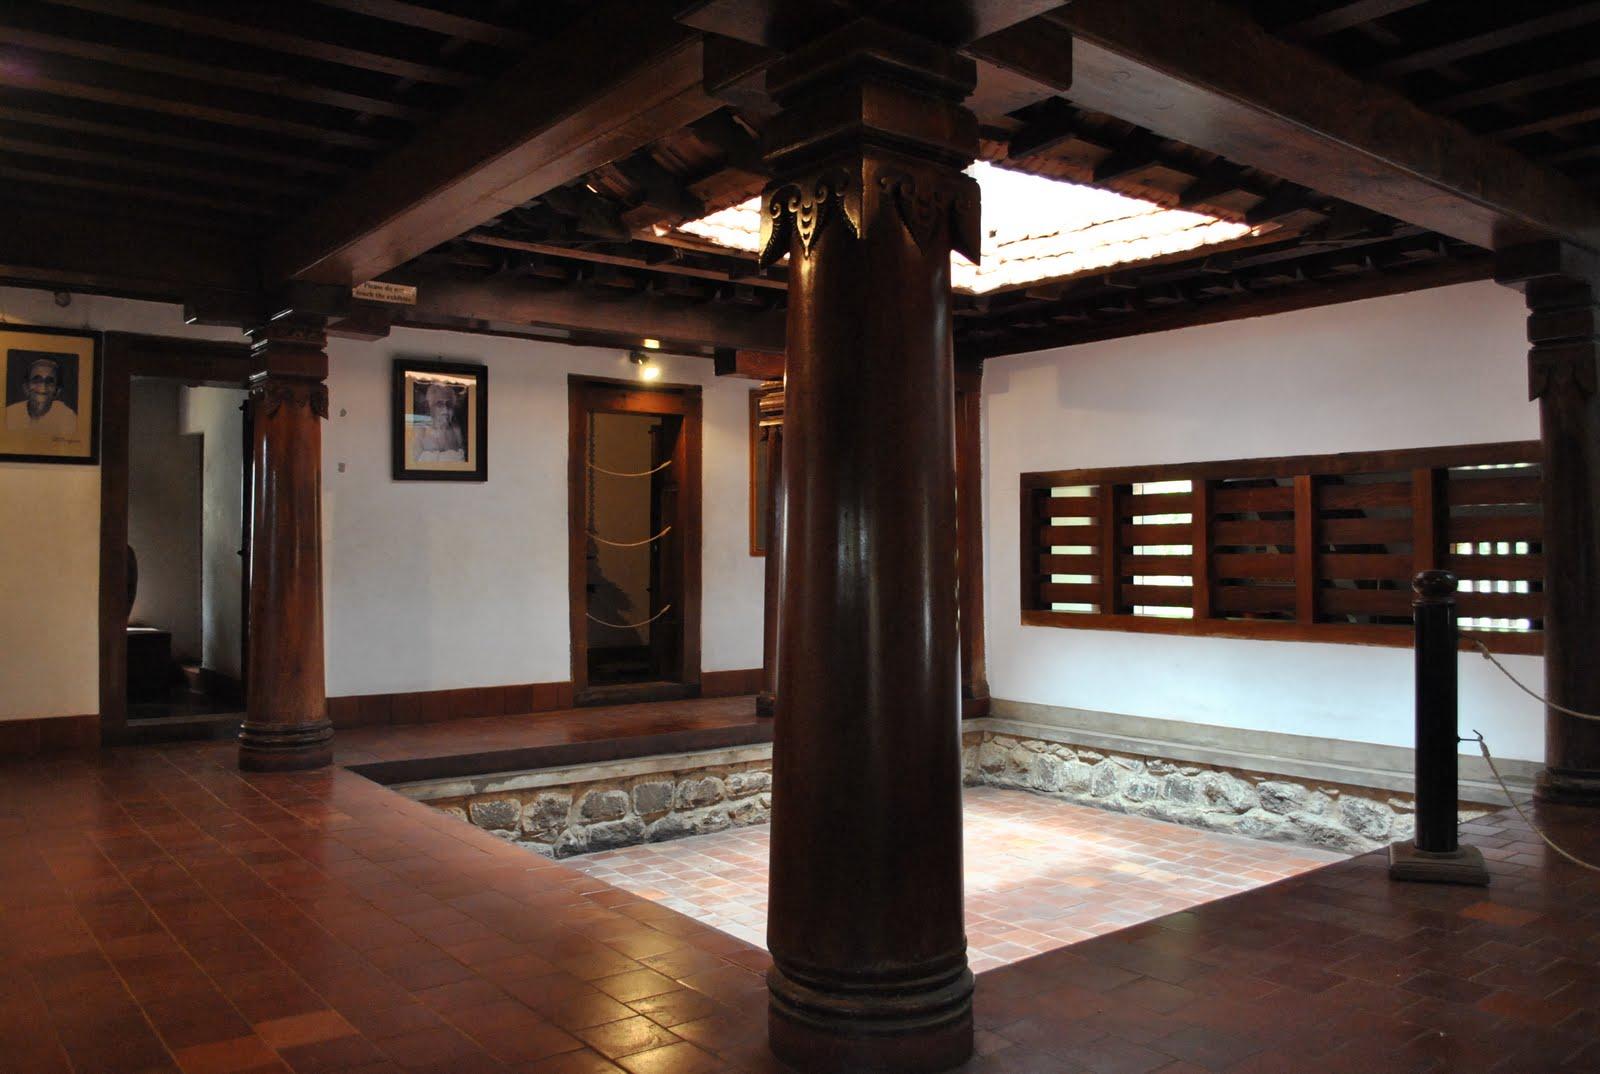 Dakshin Chitra Courtyard Home via ShadowsGalore dot com